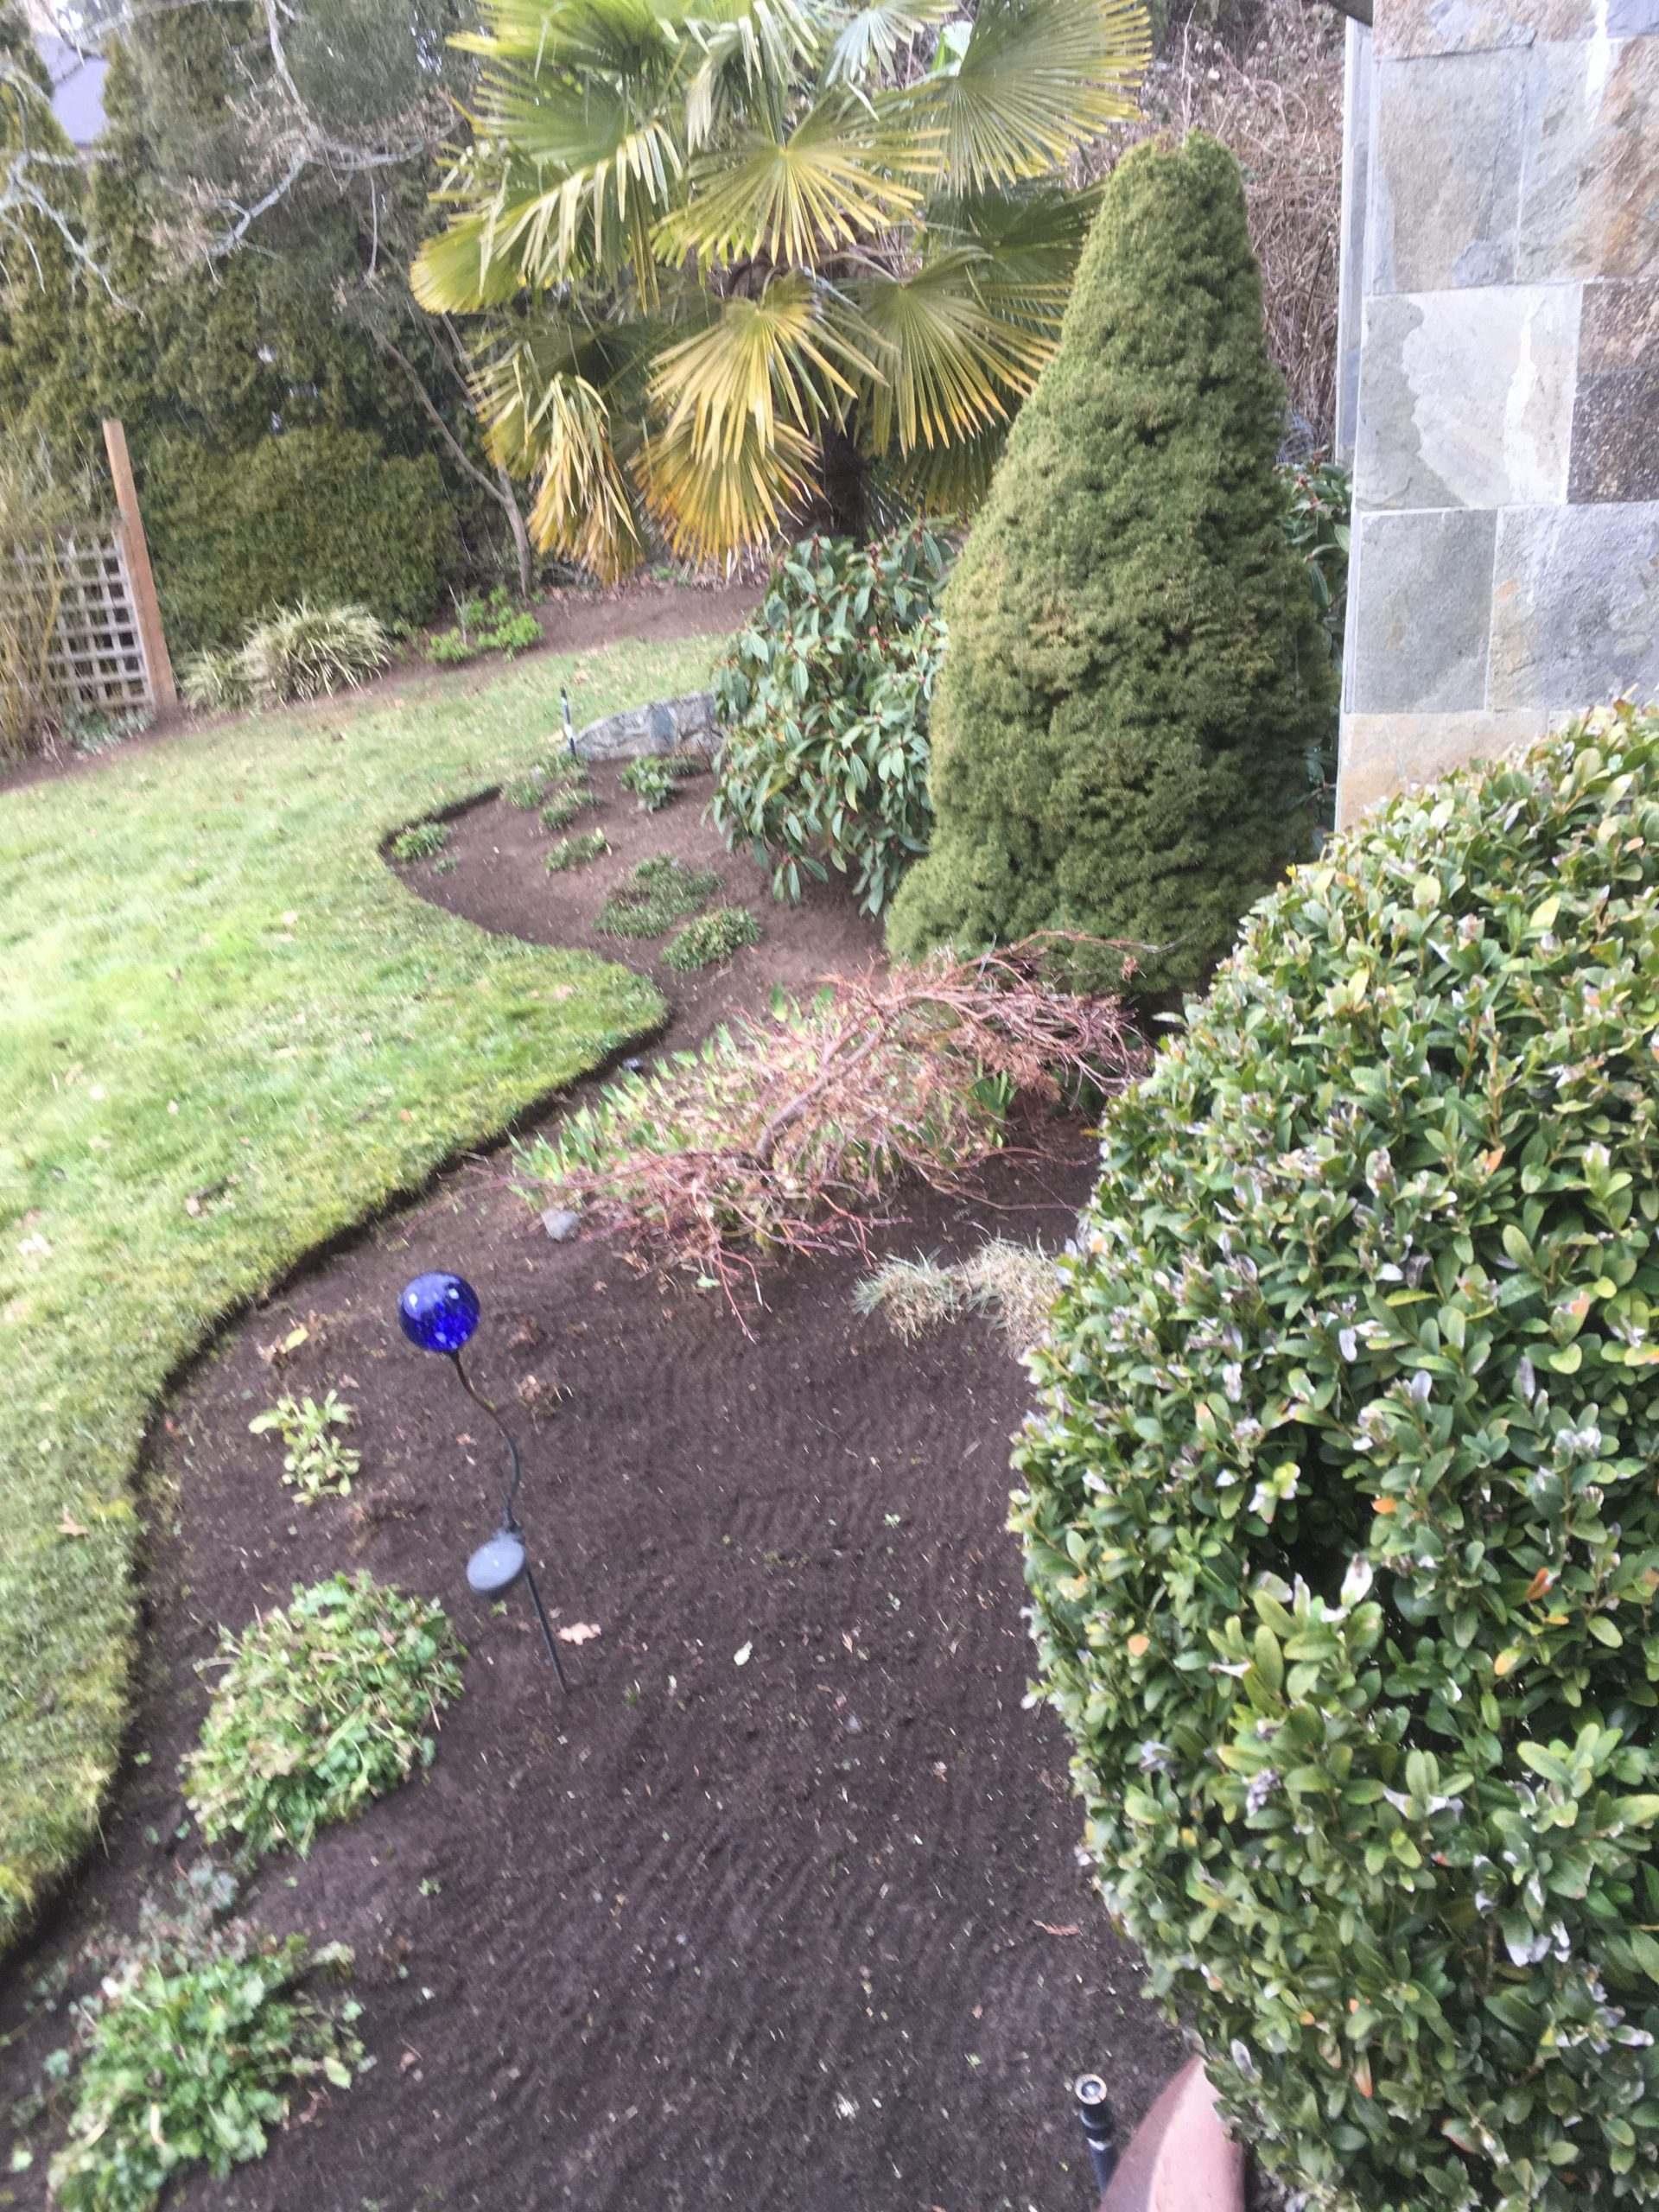 Landscaping, Yard Work and Gardening.